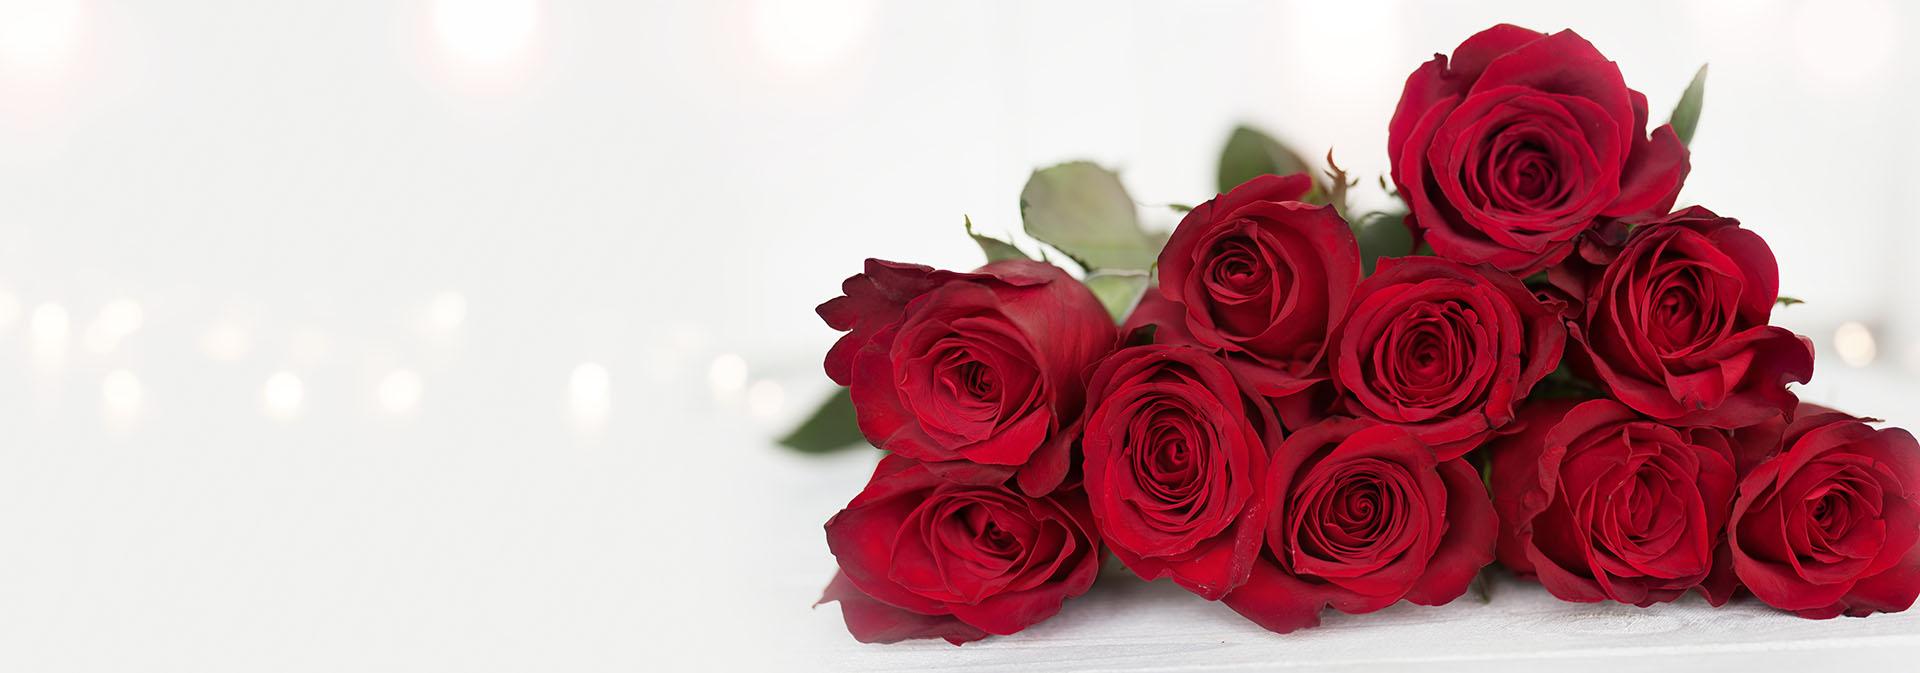 rose Season 2021